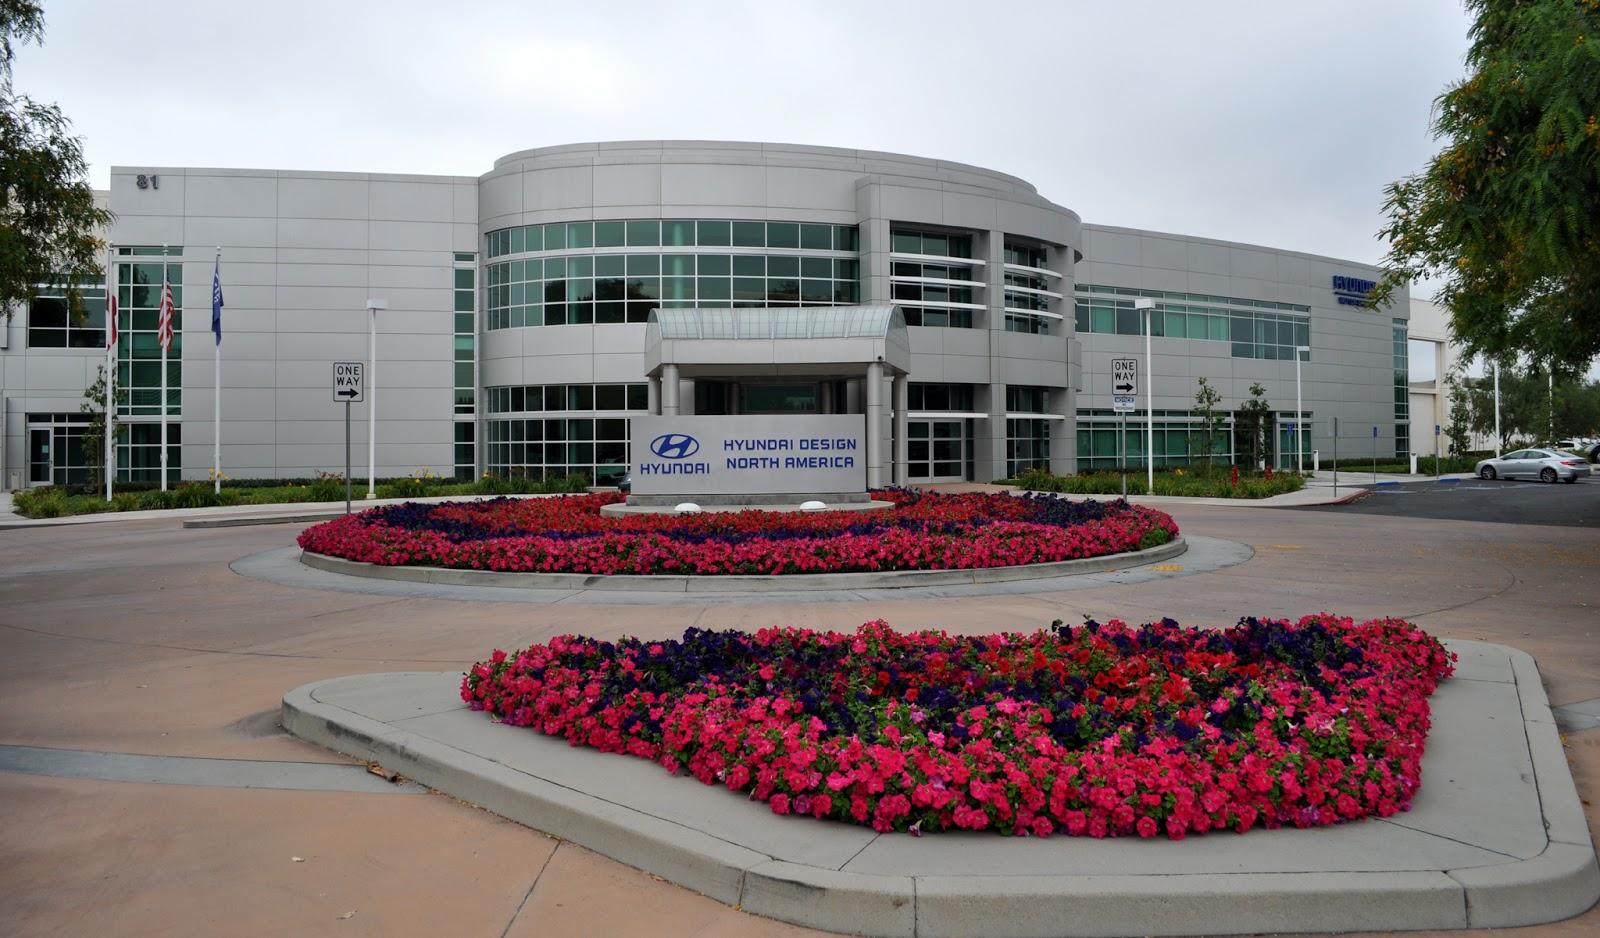 I Found The Hyundai Design Center In Irvine By Accident